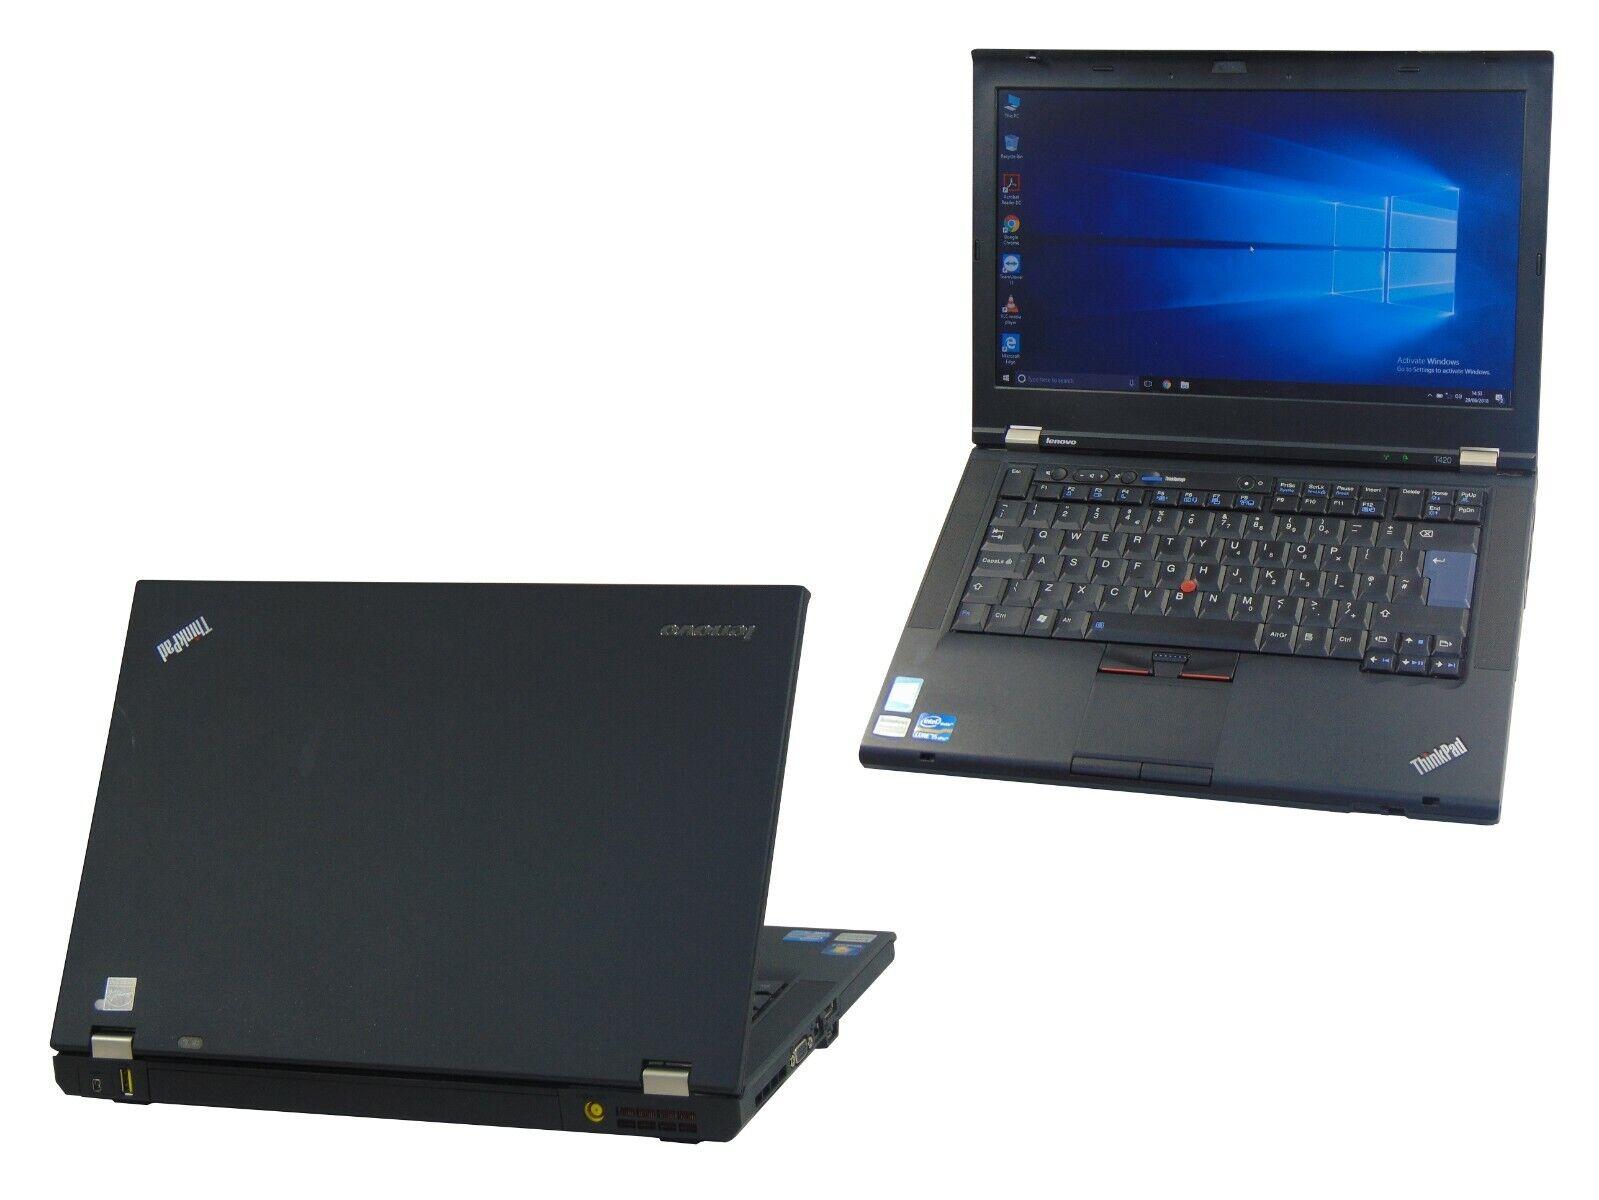 Laptop Windows - Lenovo Laptop Windows 10 Thinkpad T420 Laptop Core i5 2.50GHz 4GB 500GB Warranty